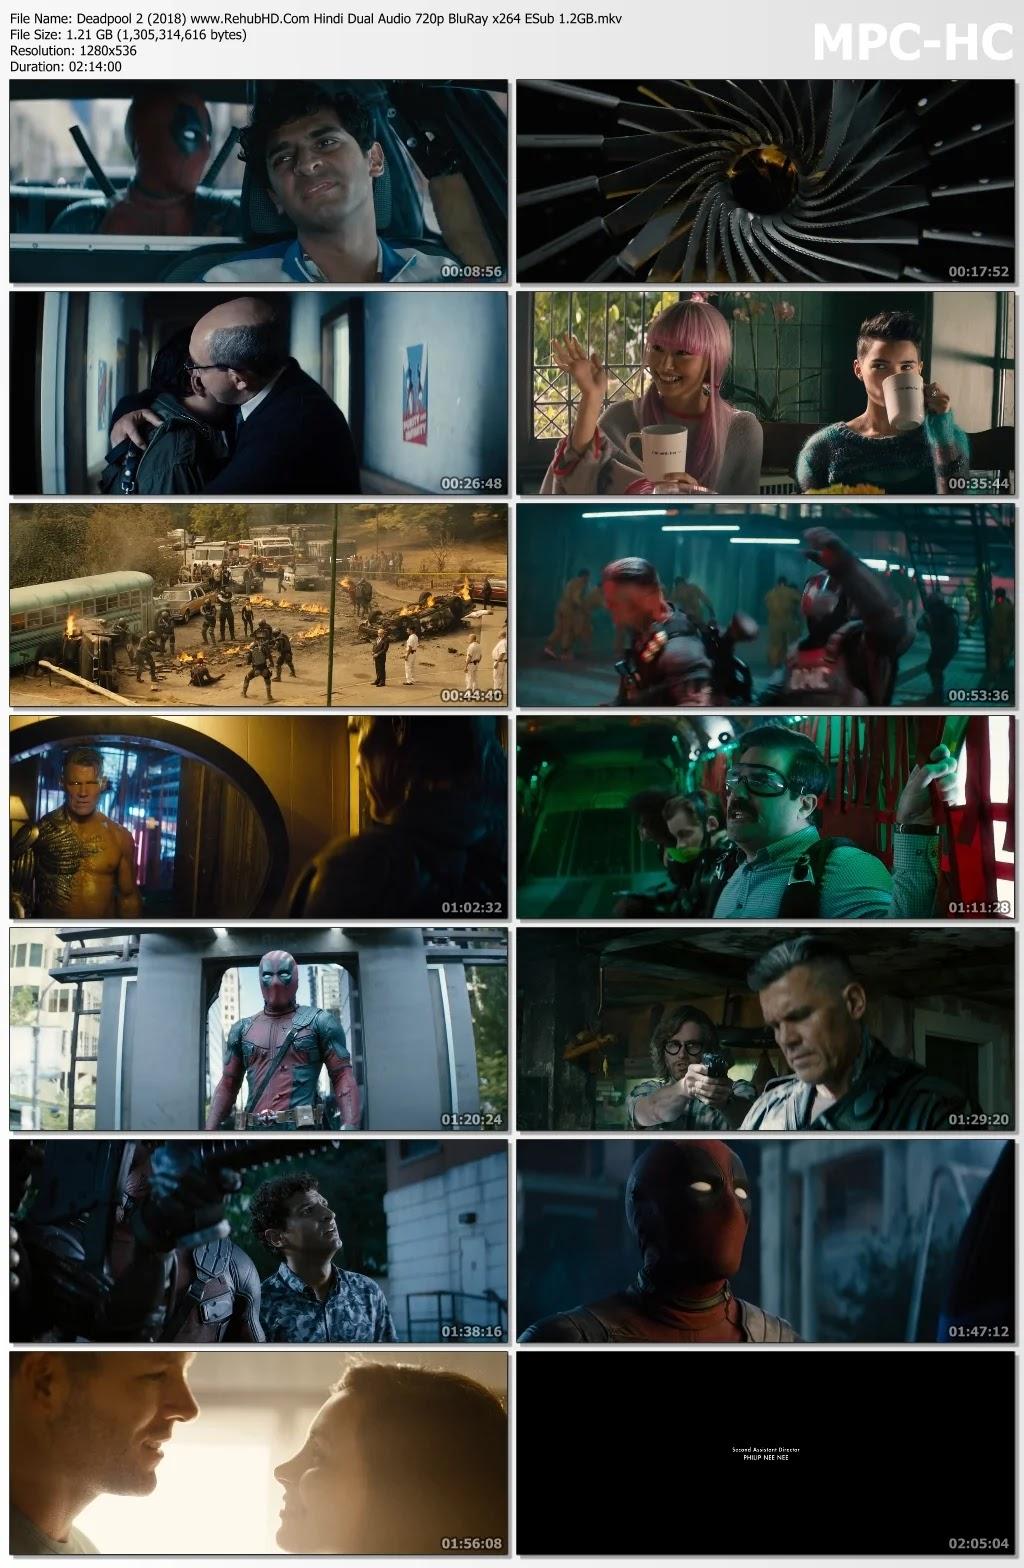 Deadpool 2 2018 Movie Free Download Full HD Dual Audio